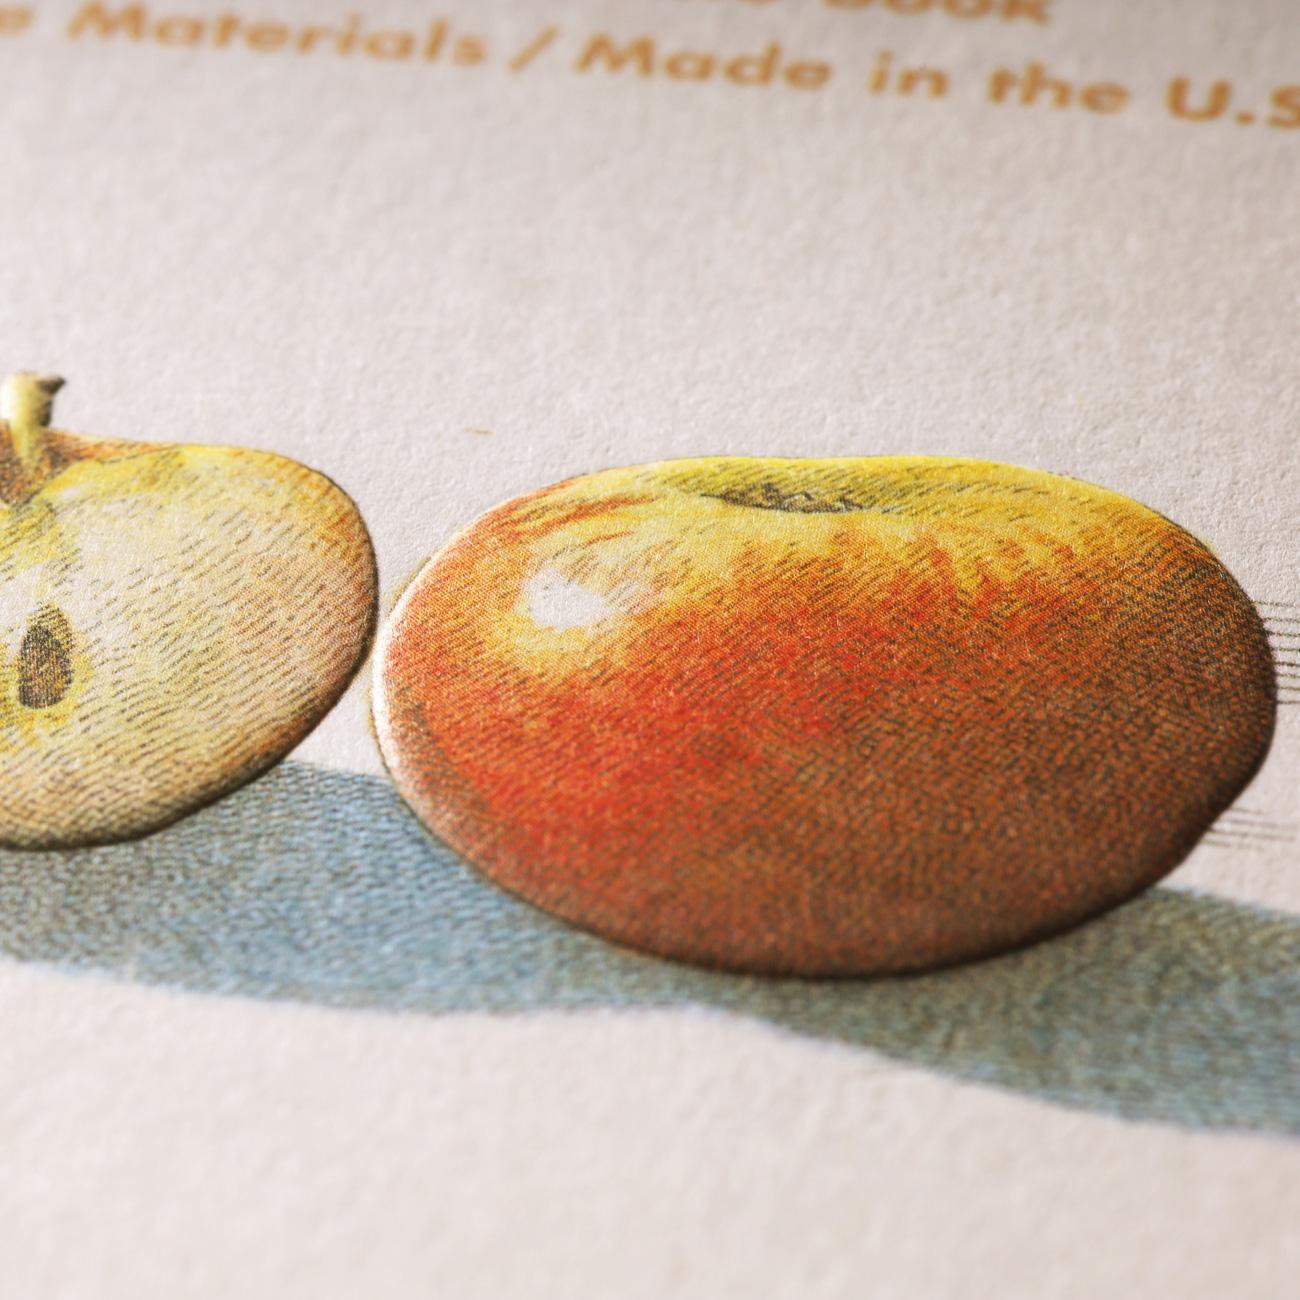 Field Notes, Harvest, Detail, Illustriert